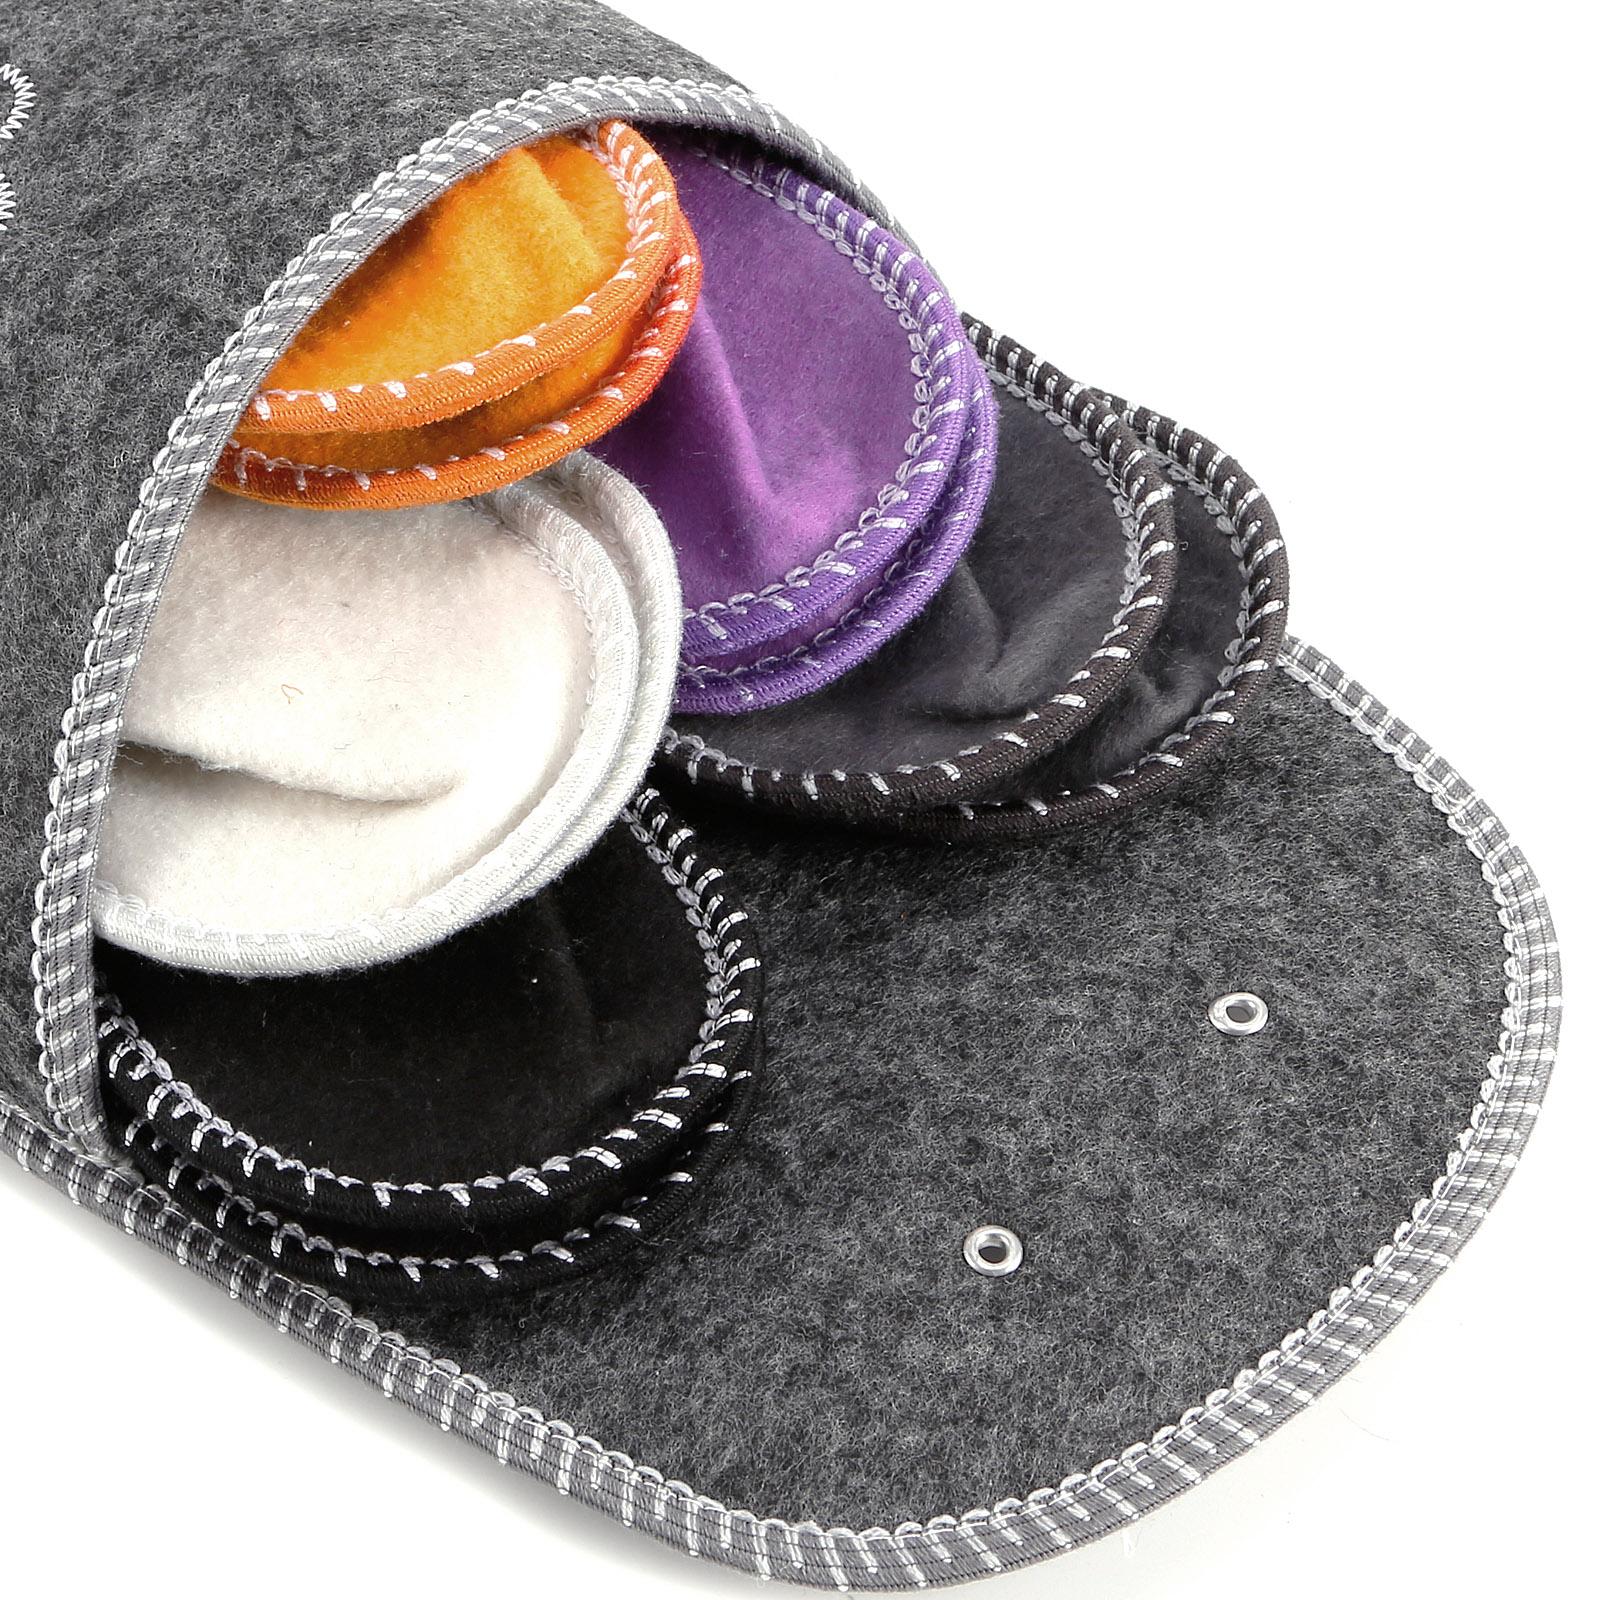 blumen grau g stehausschuhe pantoffel hausschuhe set anti. Black Bedroom Furniture Sets. Home Design Ideas